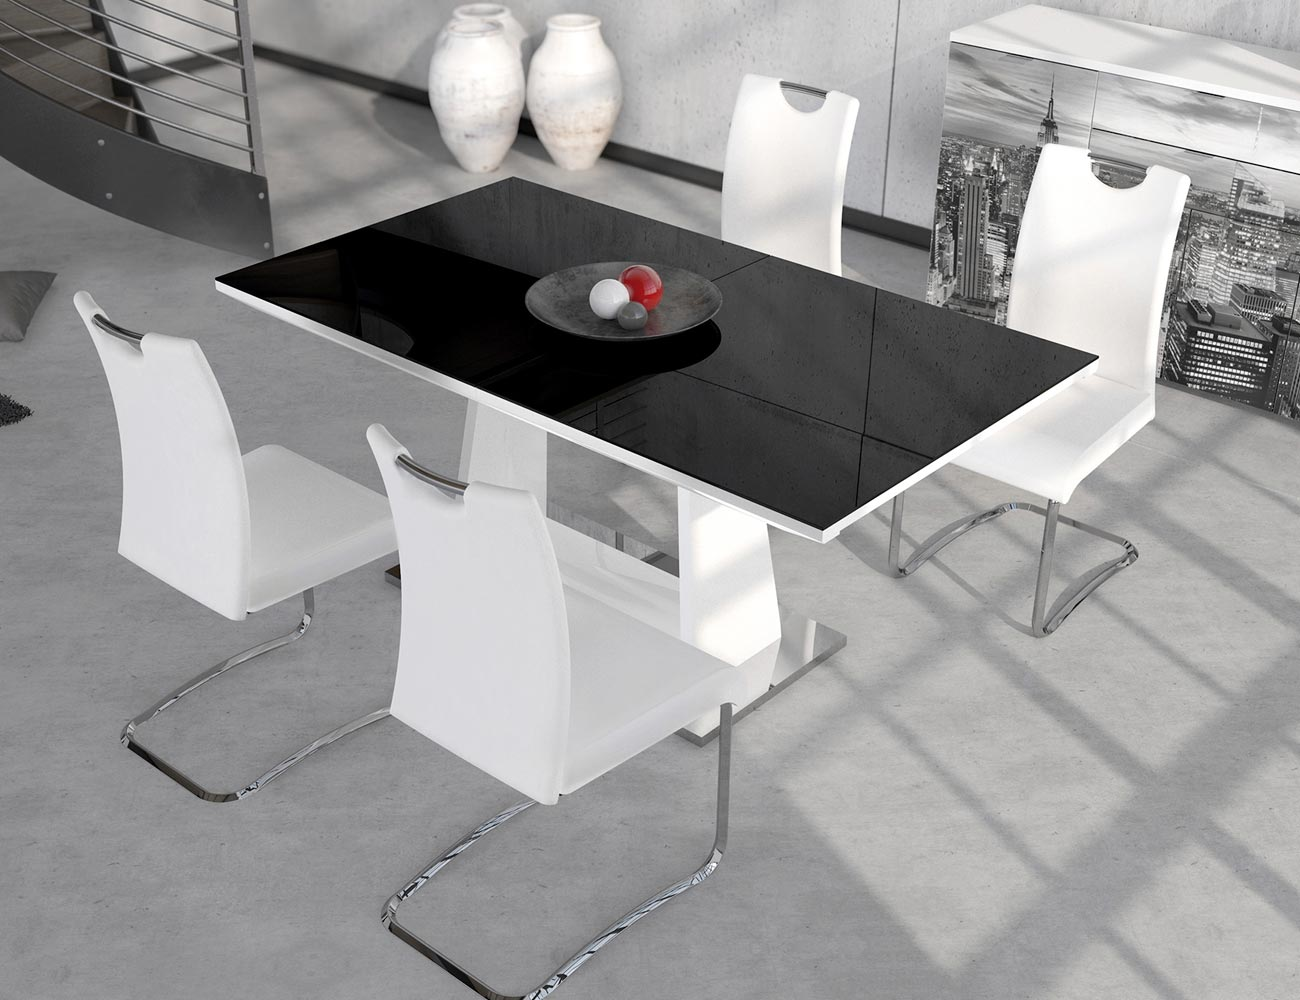 Mesa de comedor de diseño moderno extensible (3800) | Factory del ...